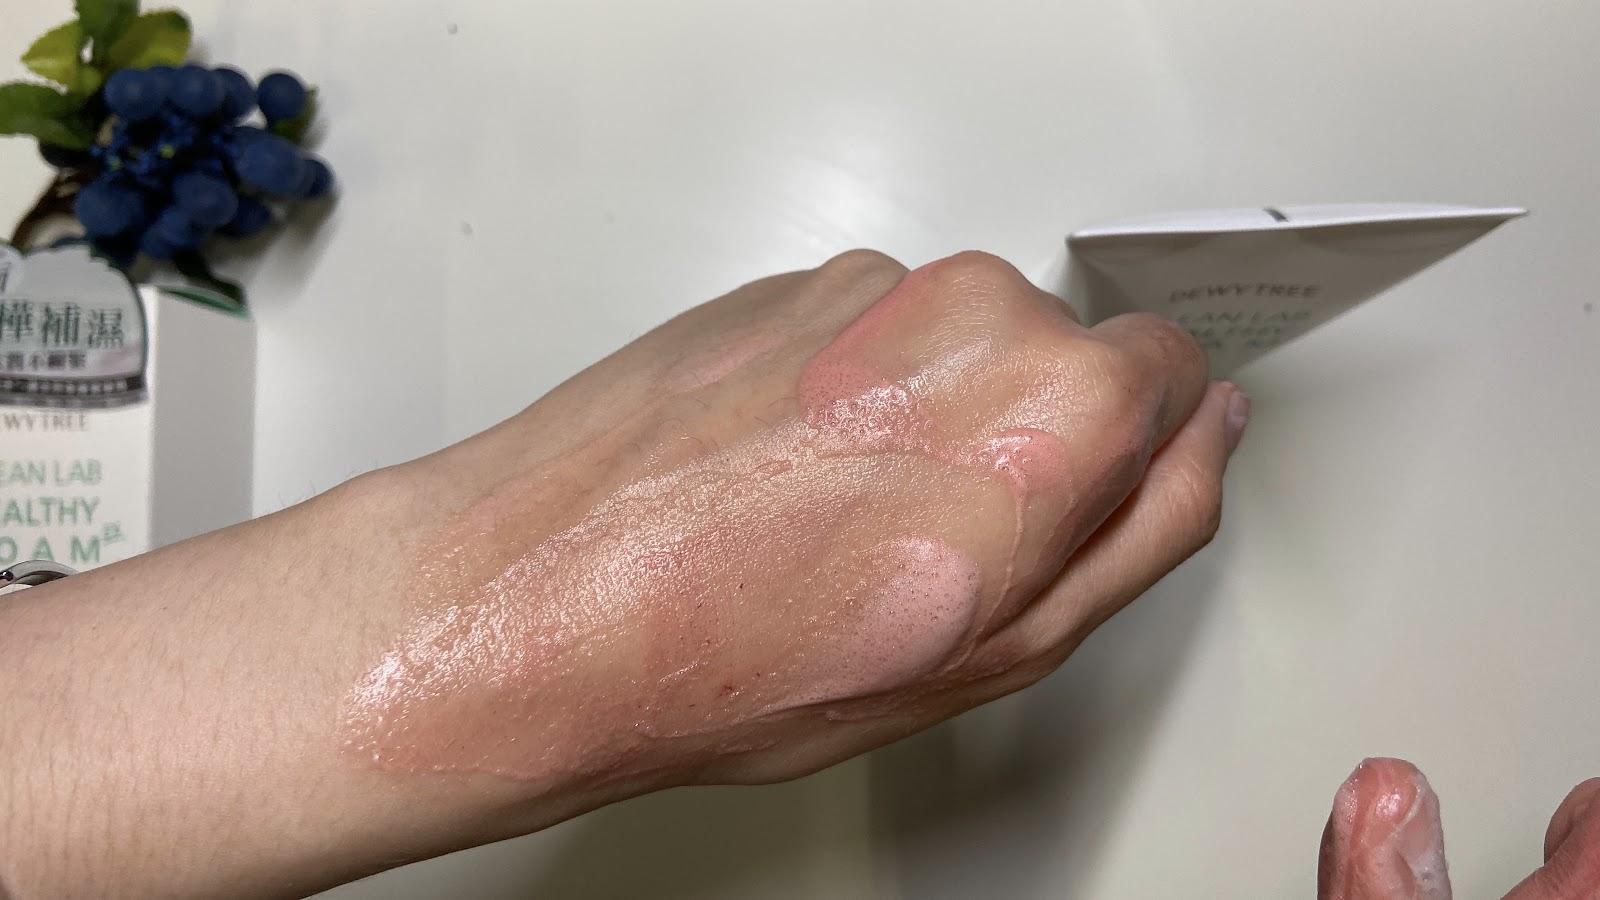 Dewytree 潔面乳 保濕 韓國 蘆薈 hk 敏感肌 好用 推薦